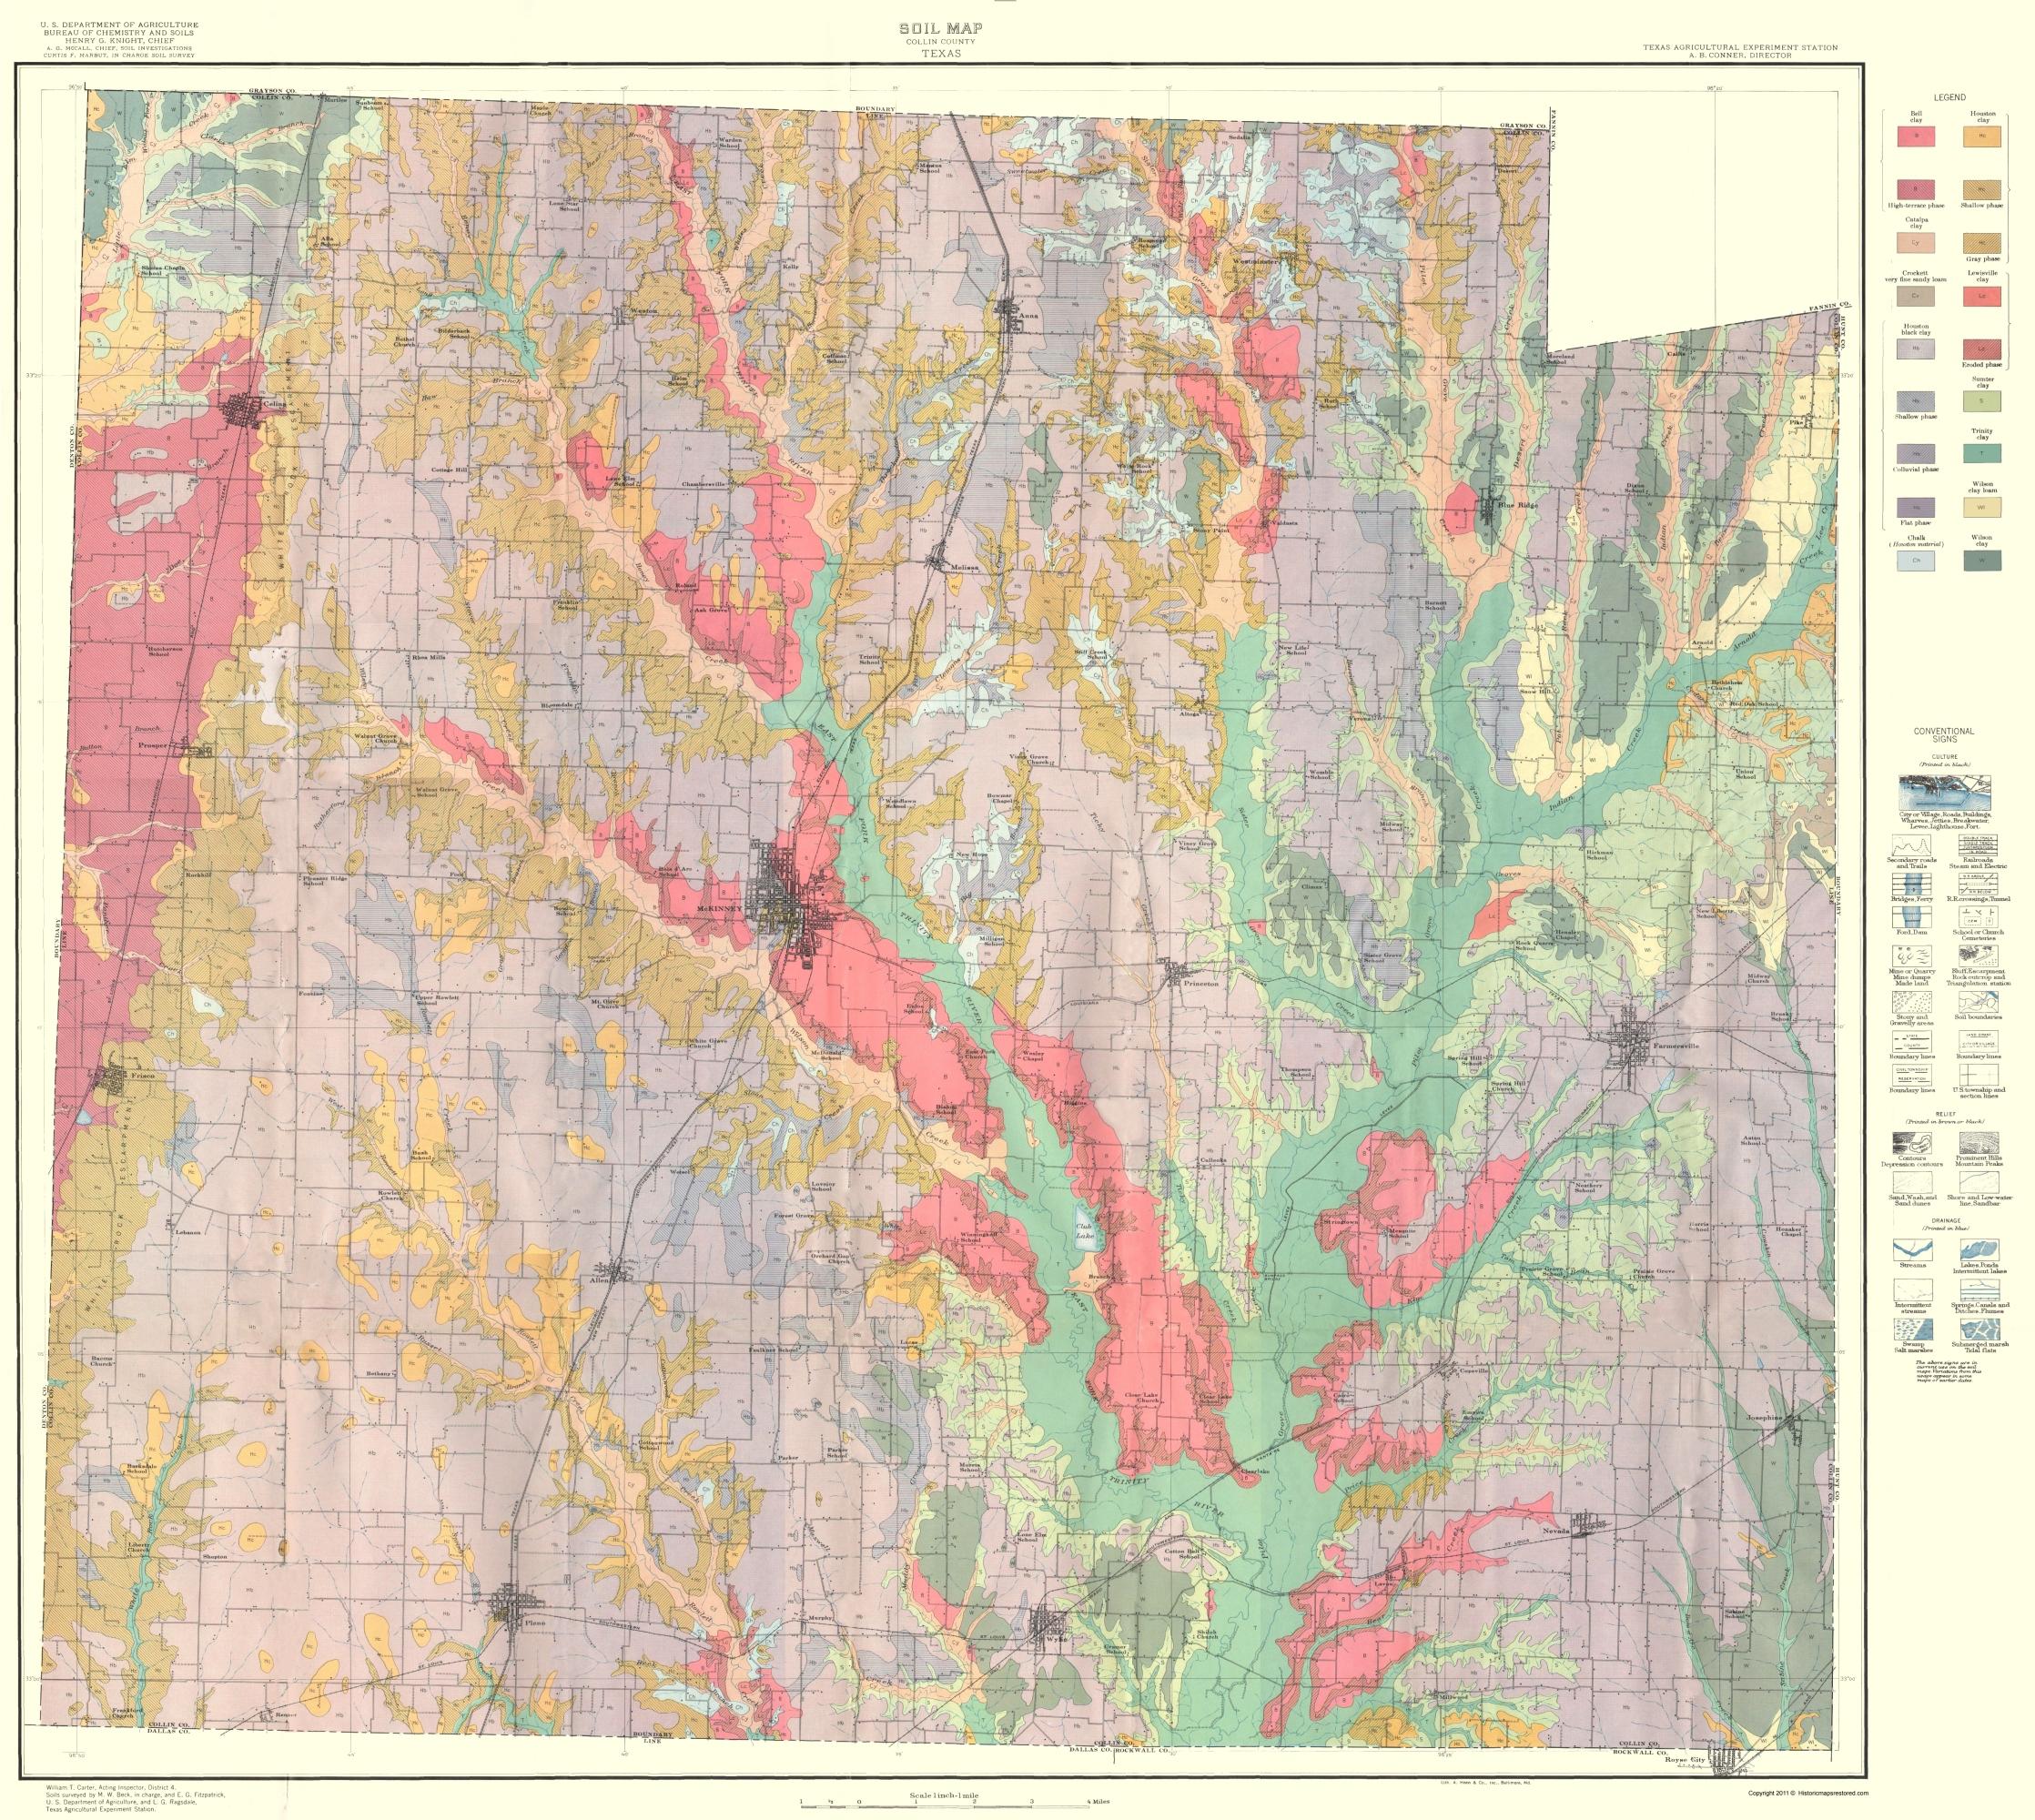 Old County Map Collin Texas Soil USDA - County maps of texas